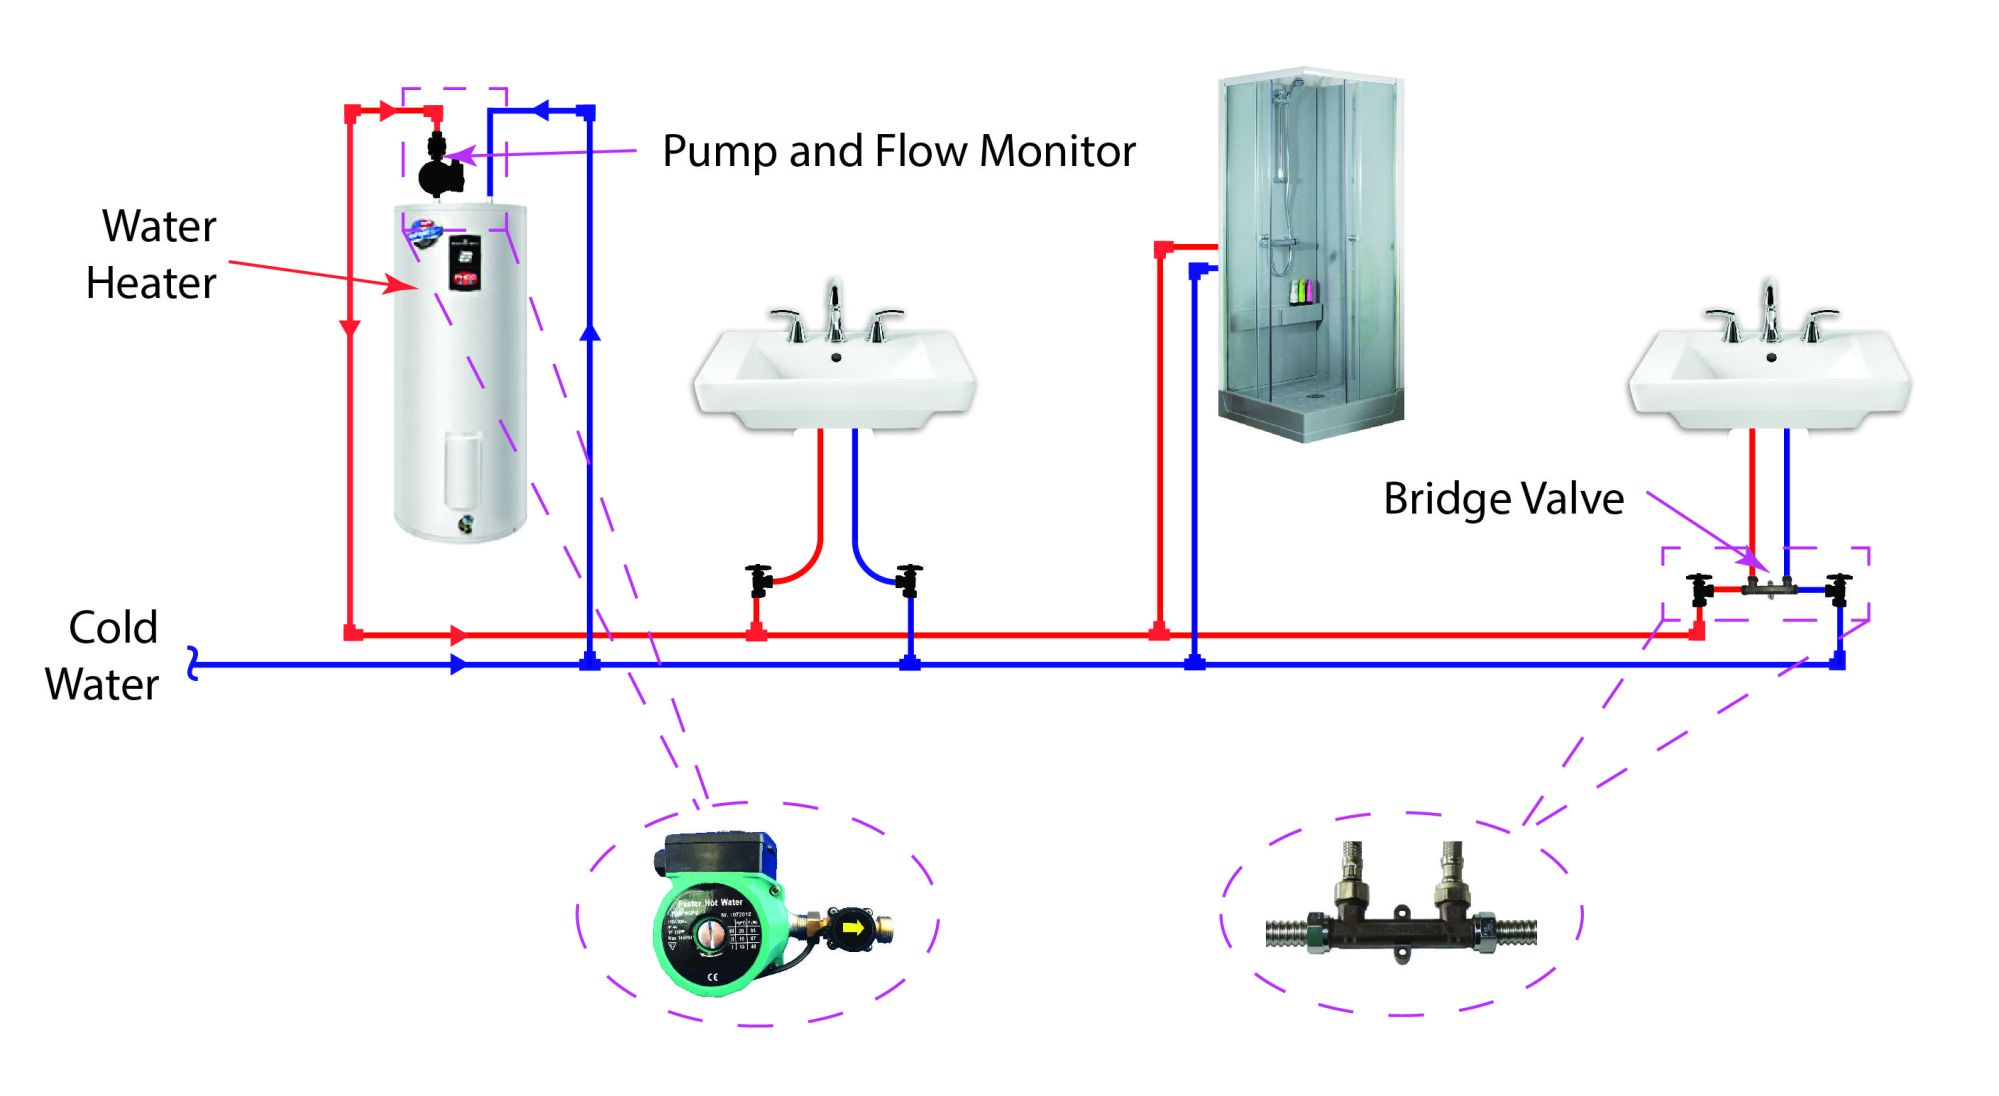 hight resolution of hot water plumbing diagram wiring diagram list hot water heater plumbing diagram hot water plumbing diagram